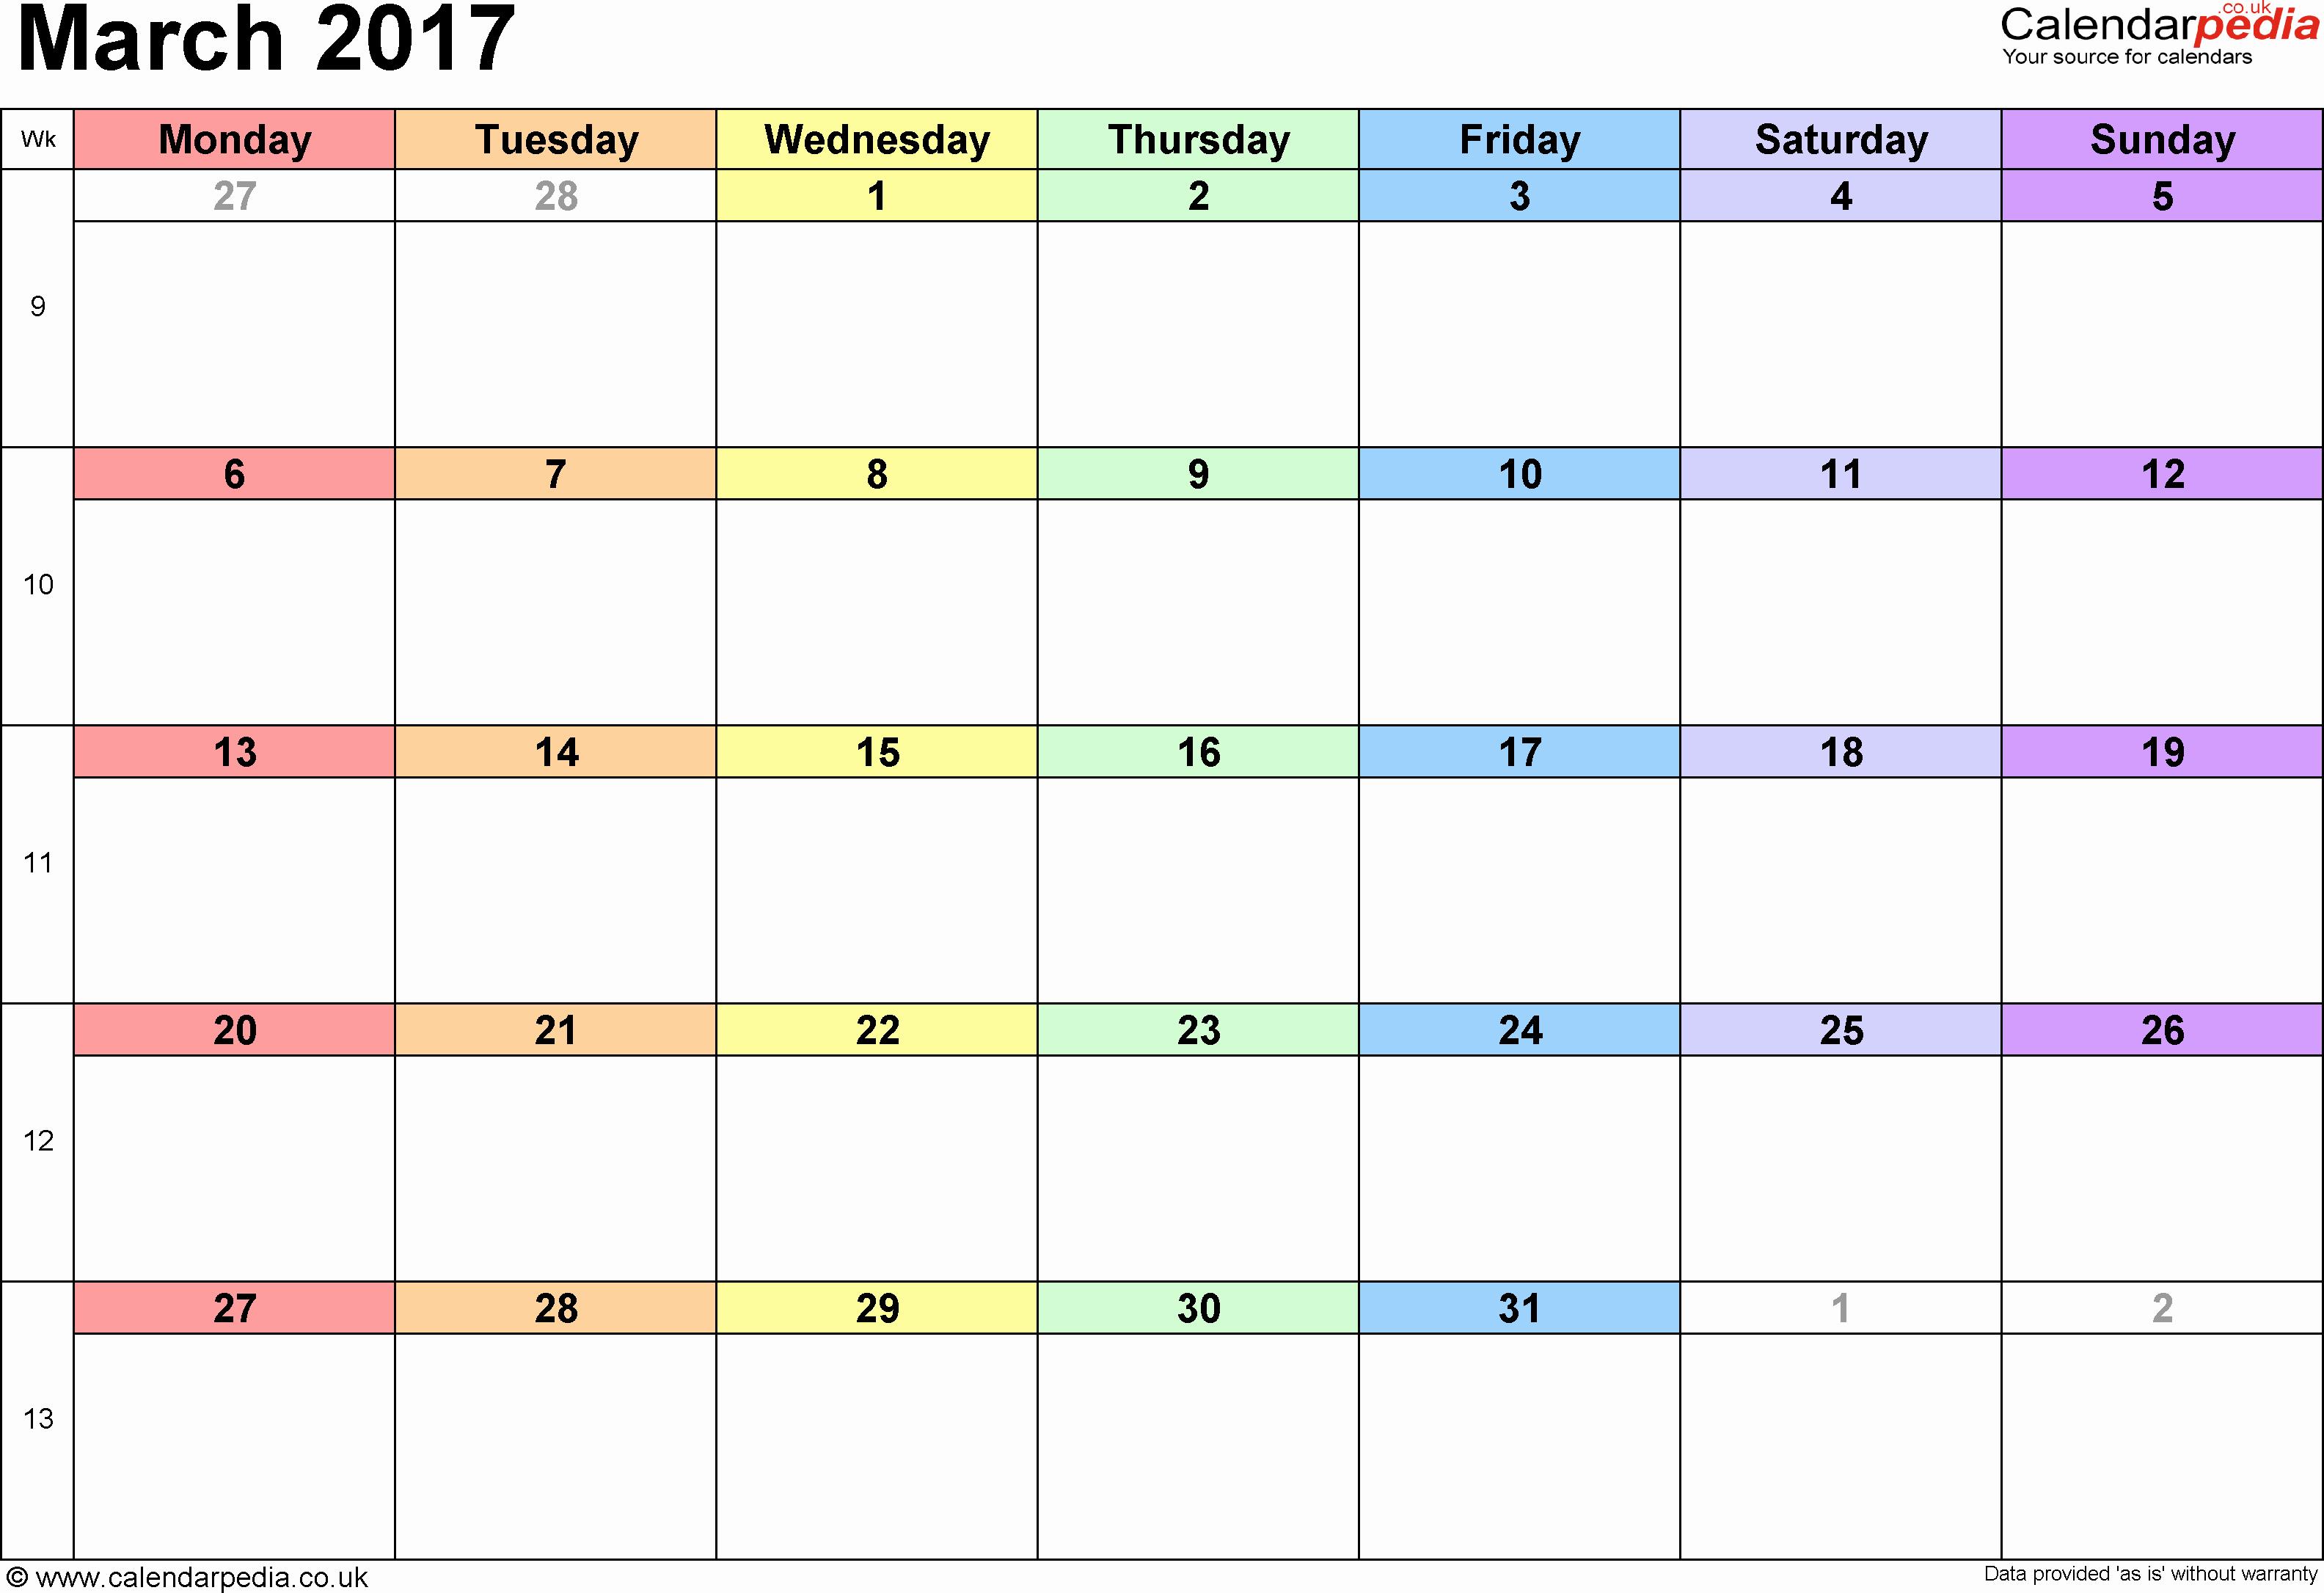 Excel Calendar 2017 with Holidays Elegant Calendar March 2017 Uk Bank Holidays Excel Pdf Word